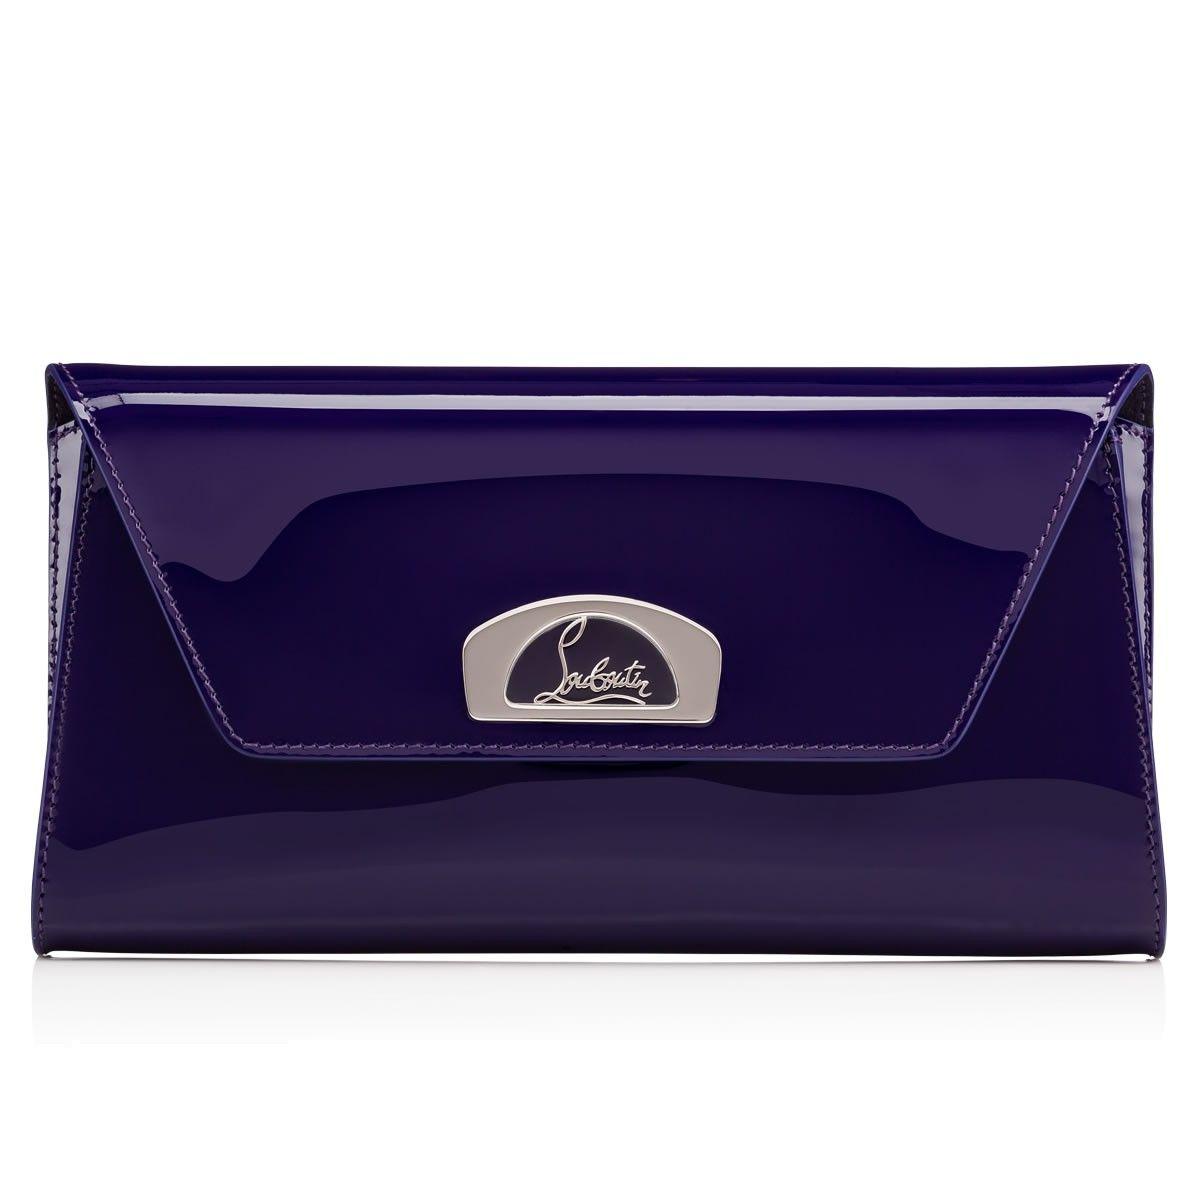 5784fab4261 CHRISTIAN LOUBOUTIN Vero-Dodat Clutch Purple Pop Patent Calfskin ...